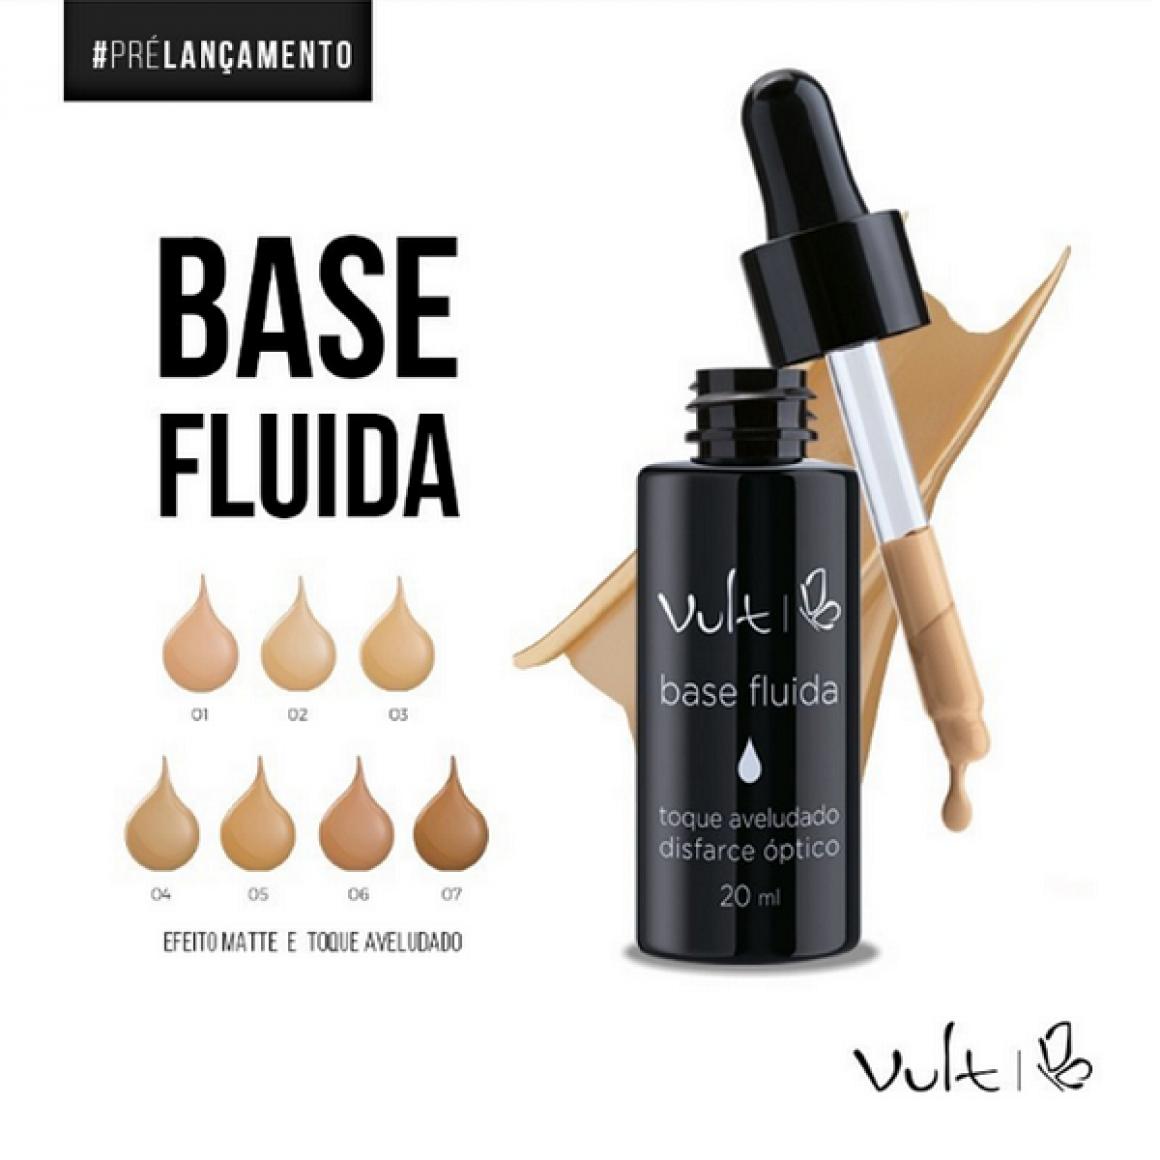 base fluida vult